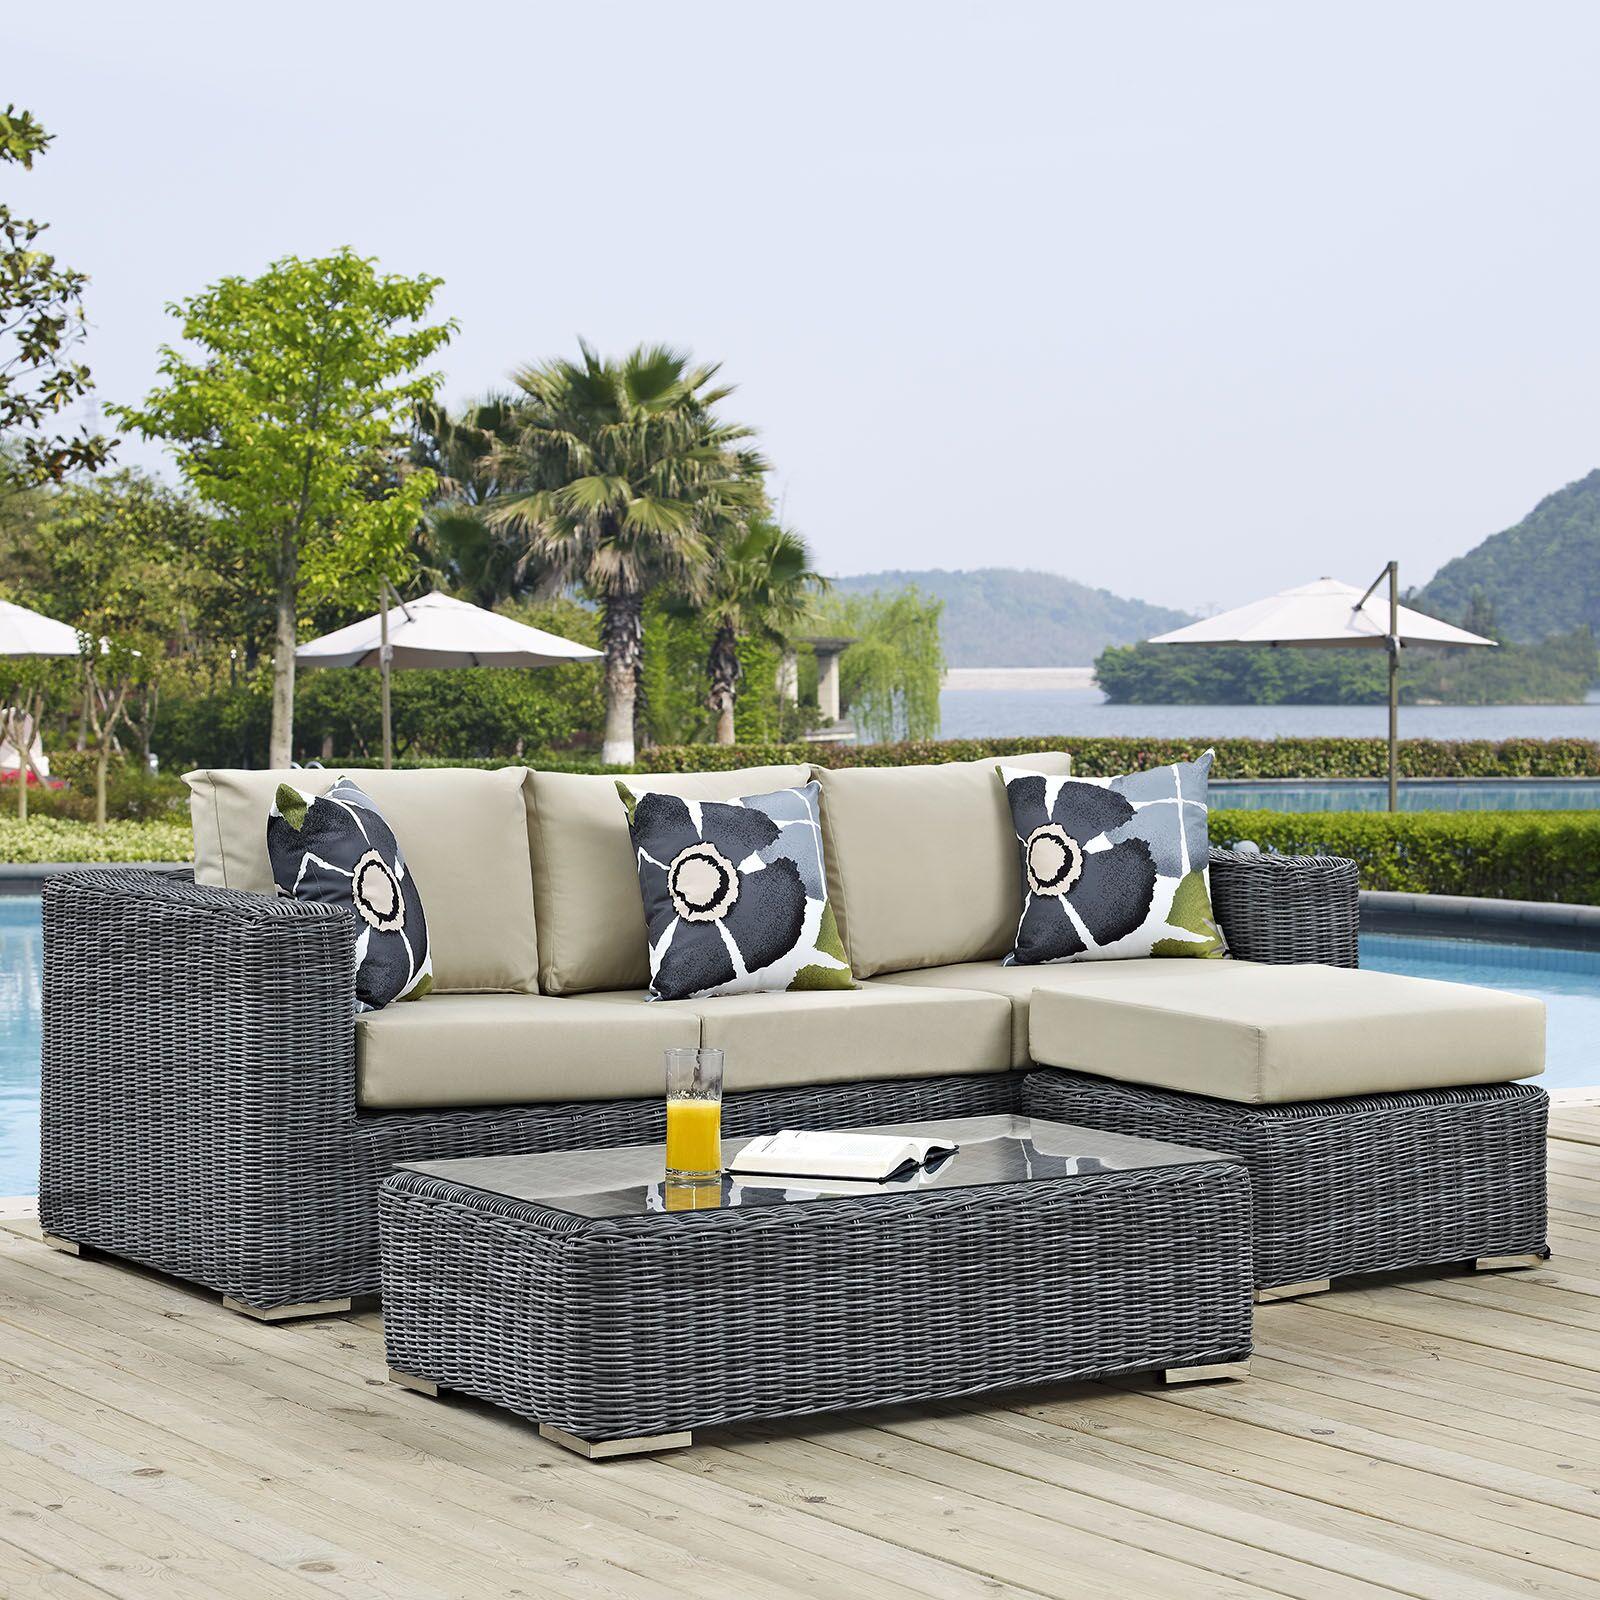 Keiran 3 Piece Sunbrella Sofa Set with Cushions Fabric: Beige